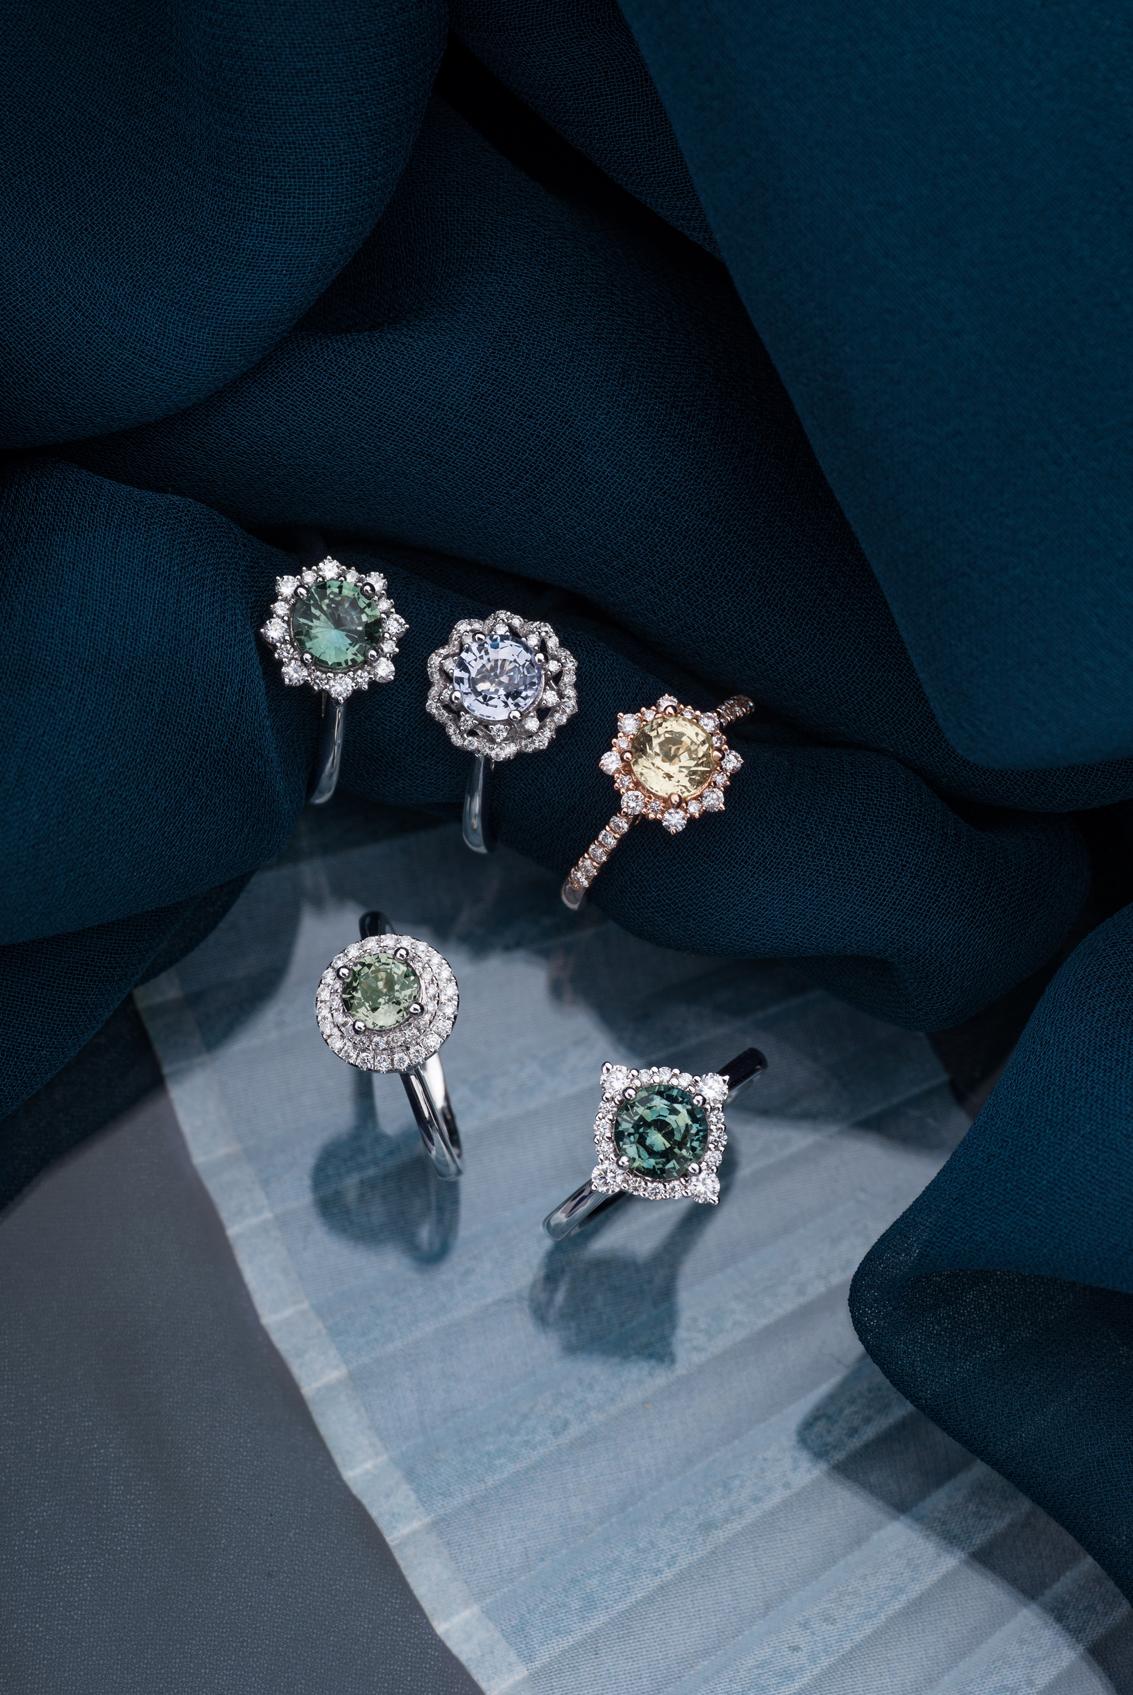 Engagement-Ring_Sapphire_Flat-Lay-1340.jpg